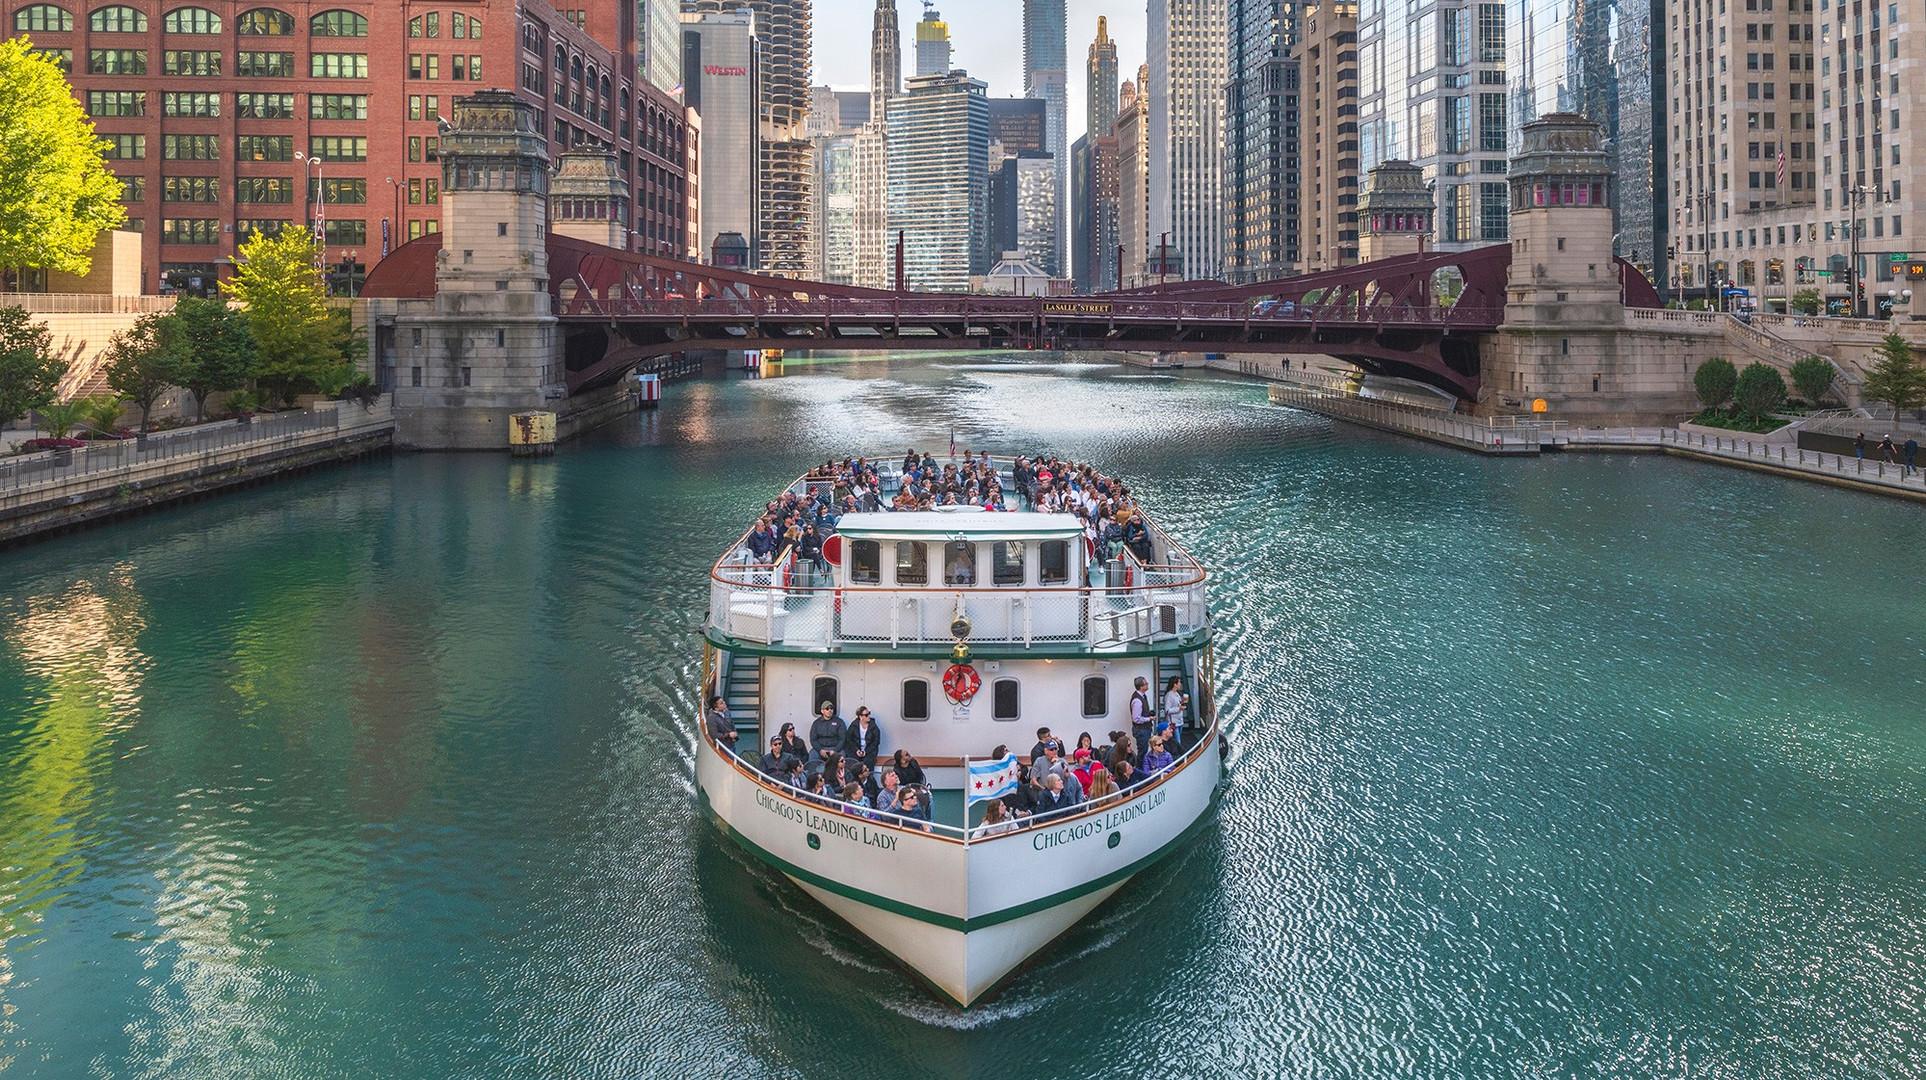 cafc-river-cruise-web-2019-2.jpg